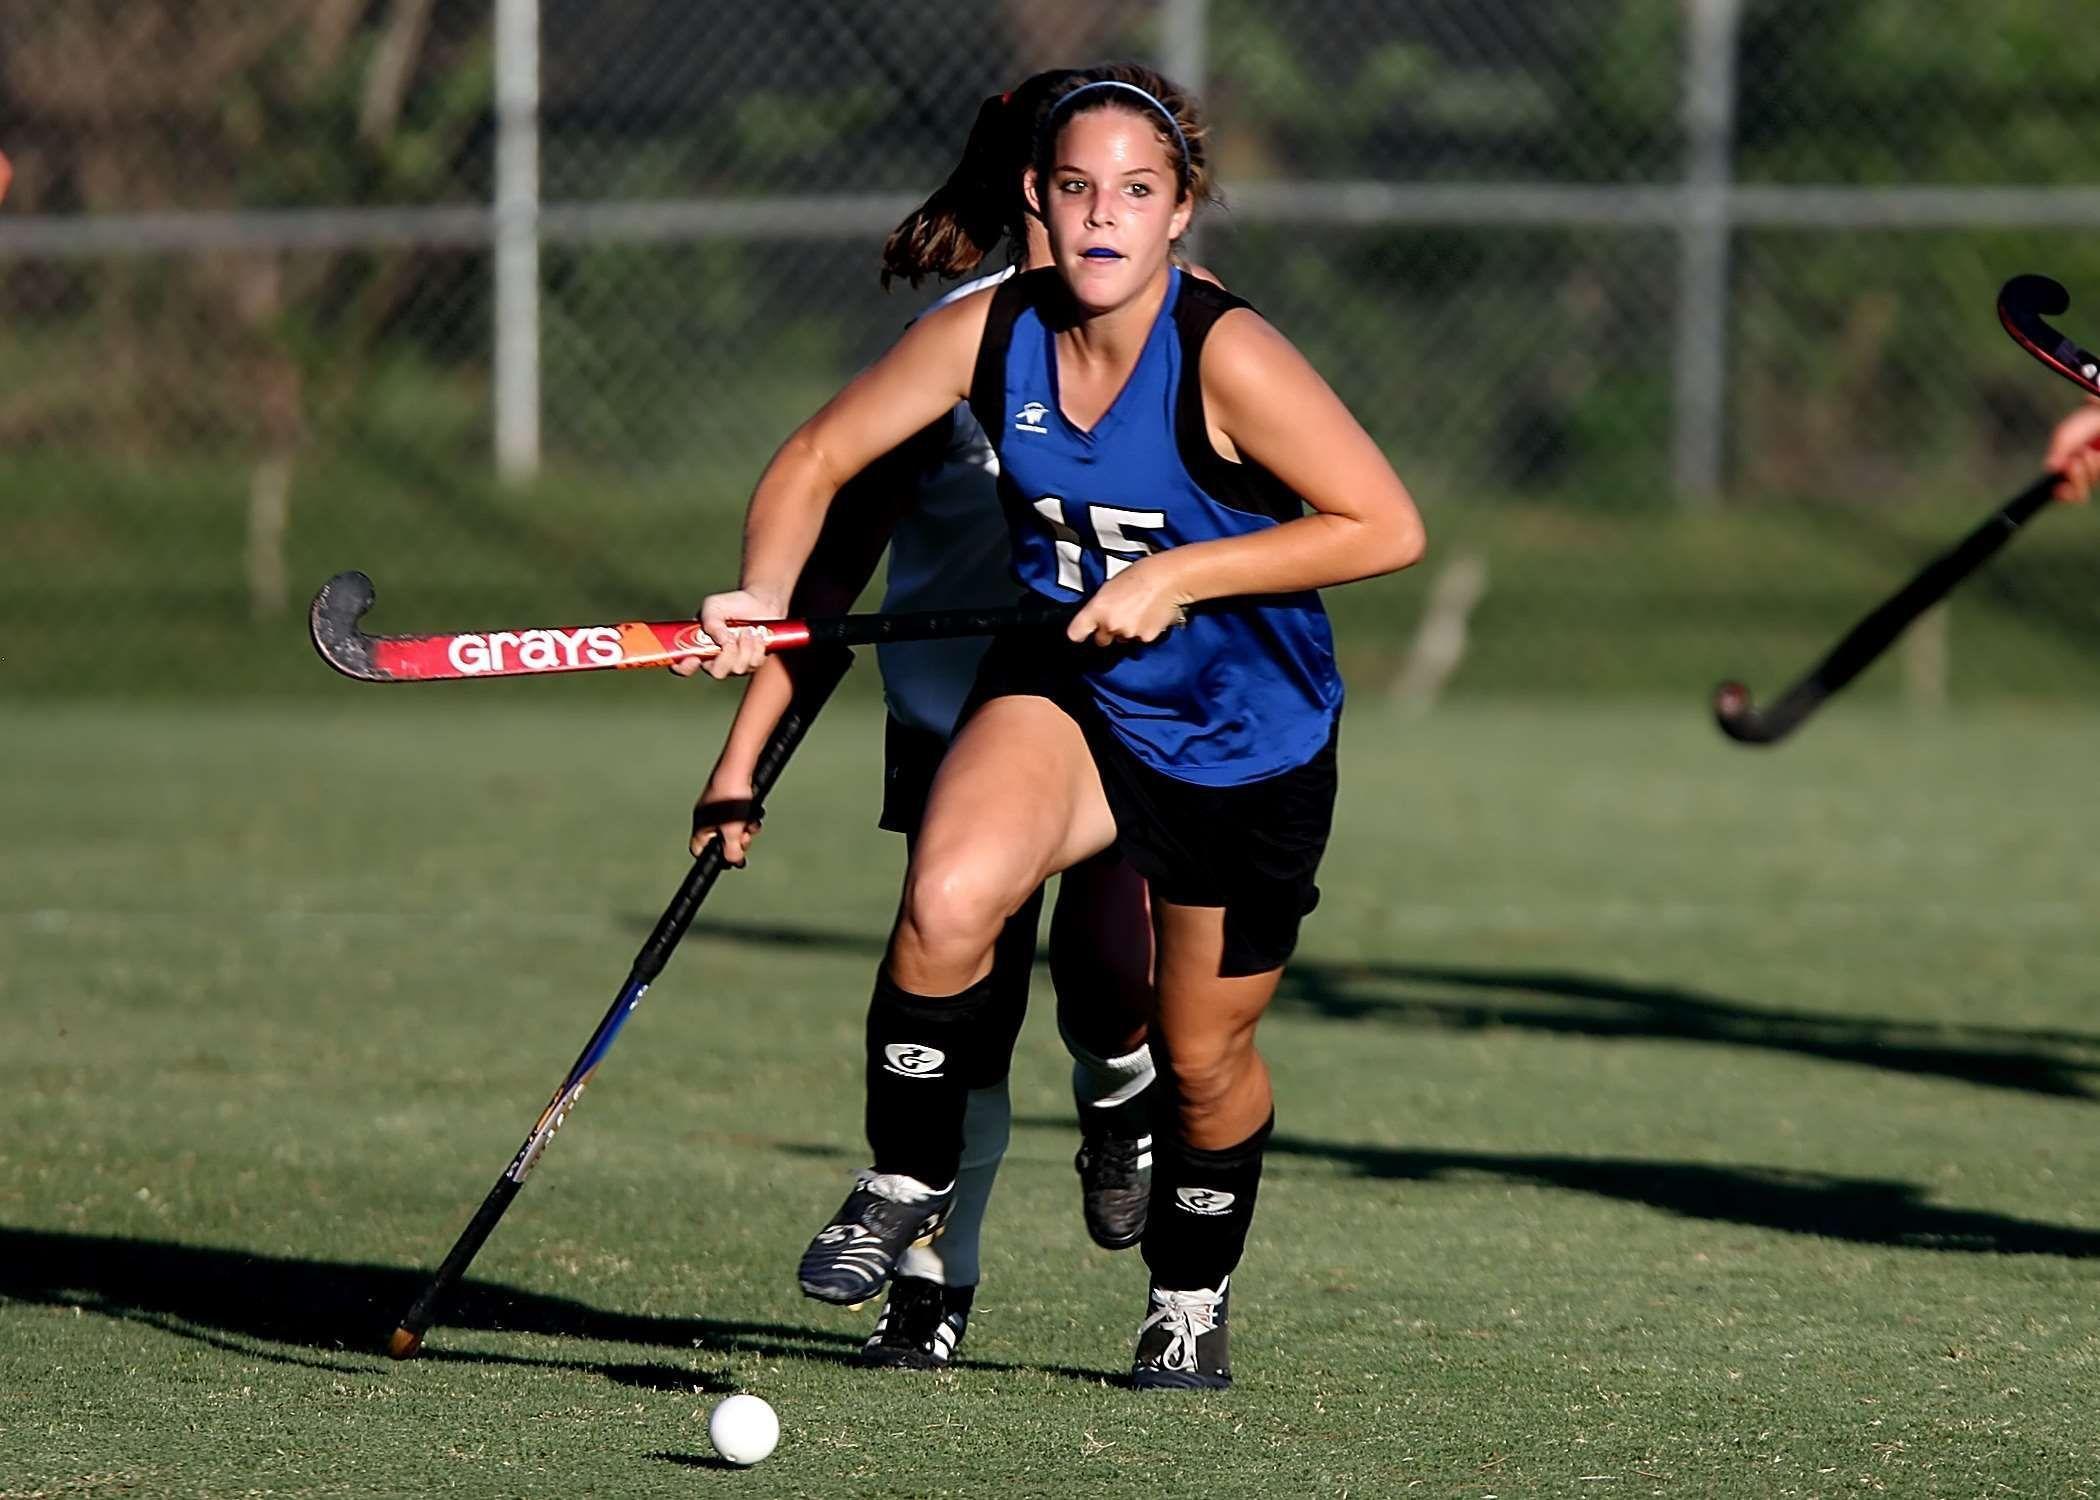 action athlete ball field hockey fun game girls